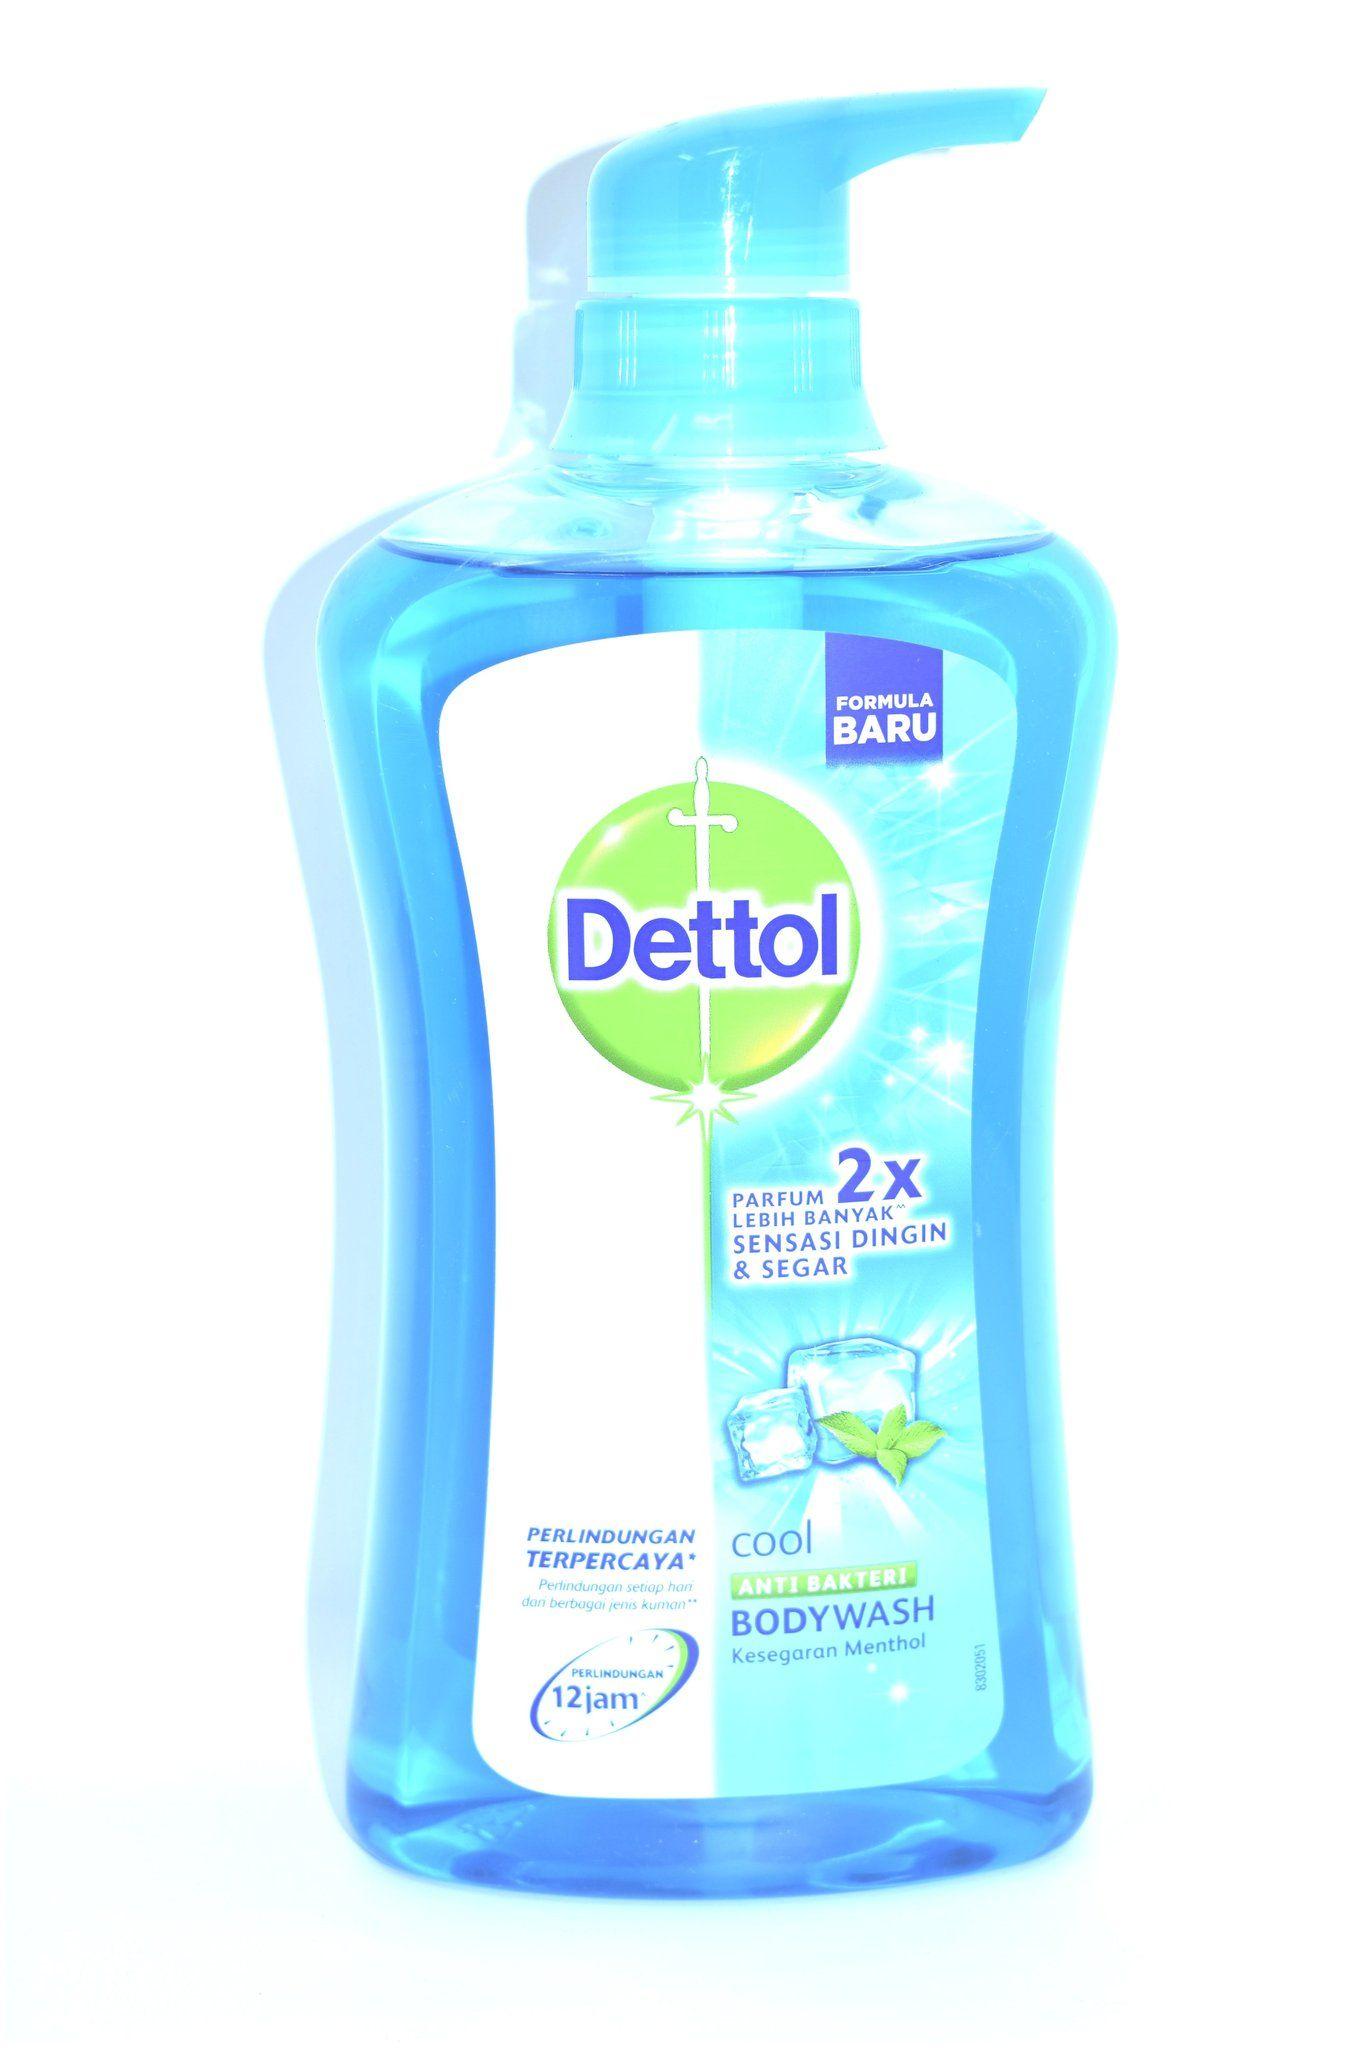 Dettol Original Instant Hand Sanitizer Redmart Online Grocery